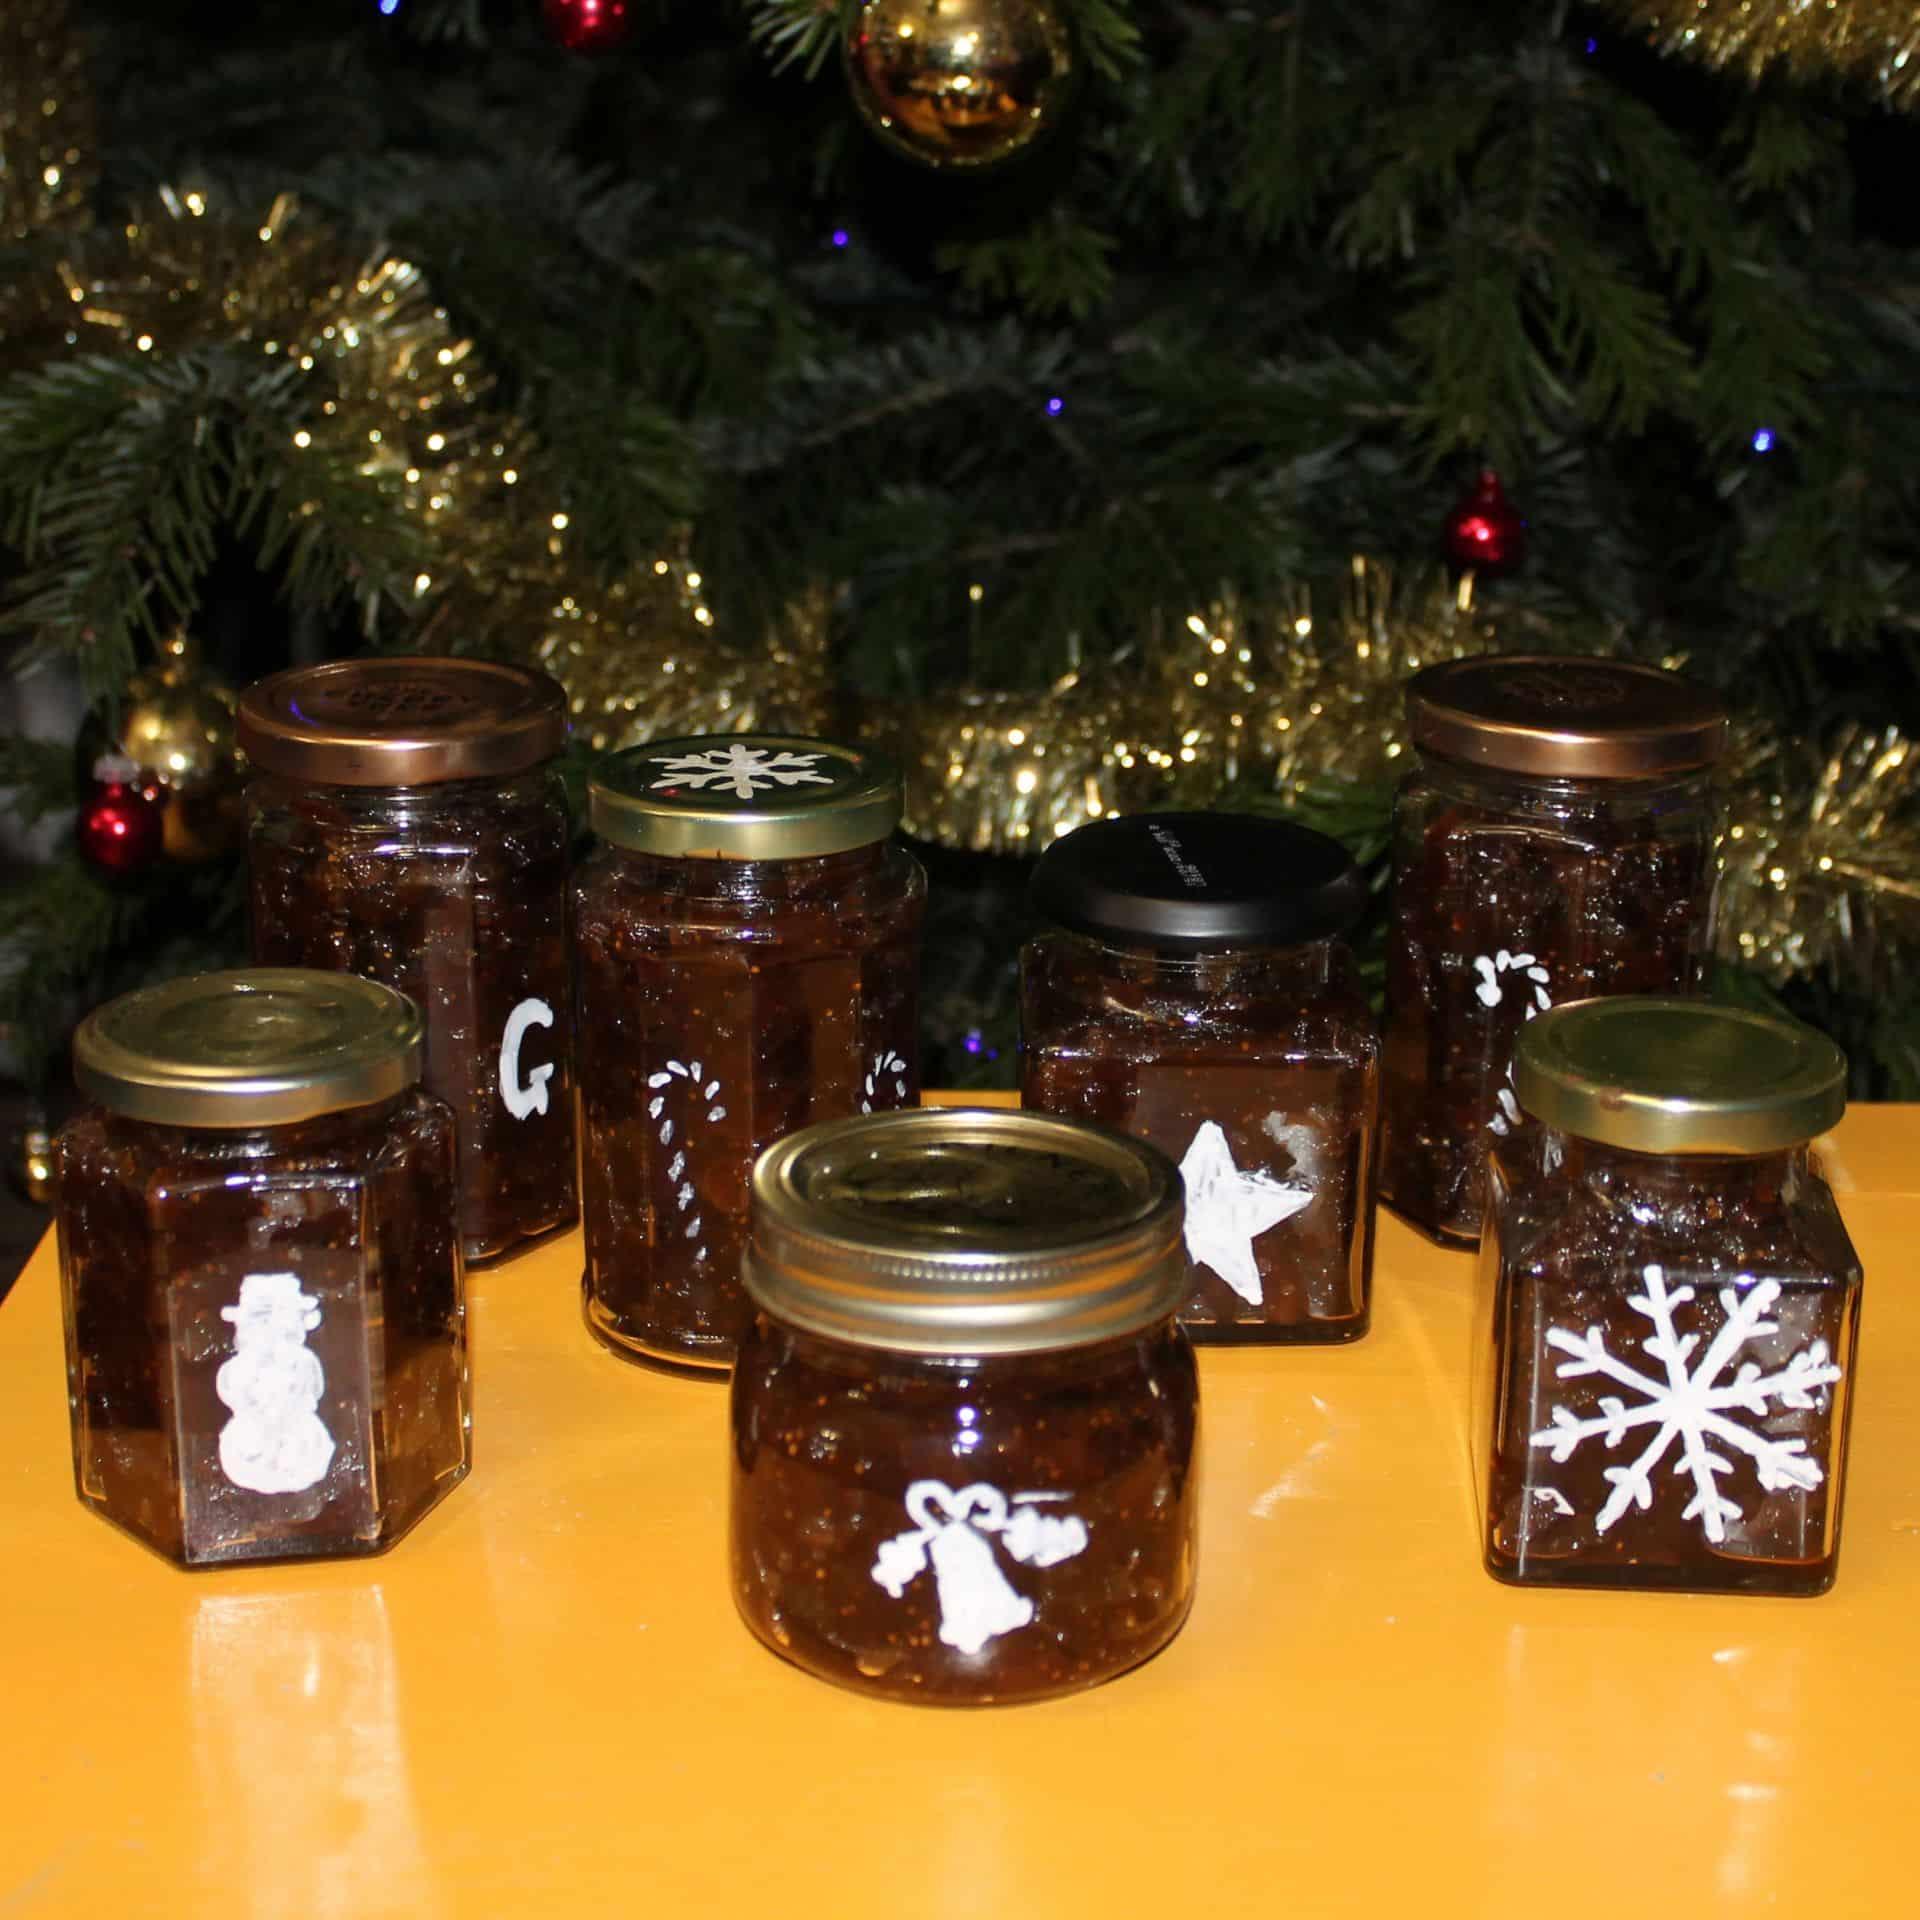 Peelable Glass Paint stencils on chutney glass jars